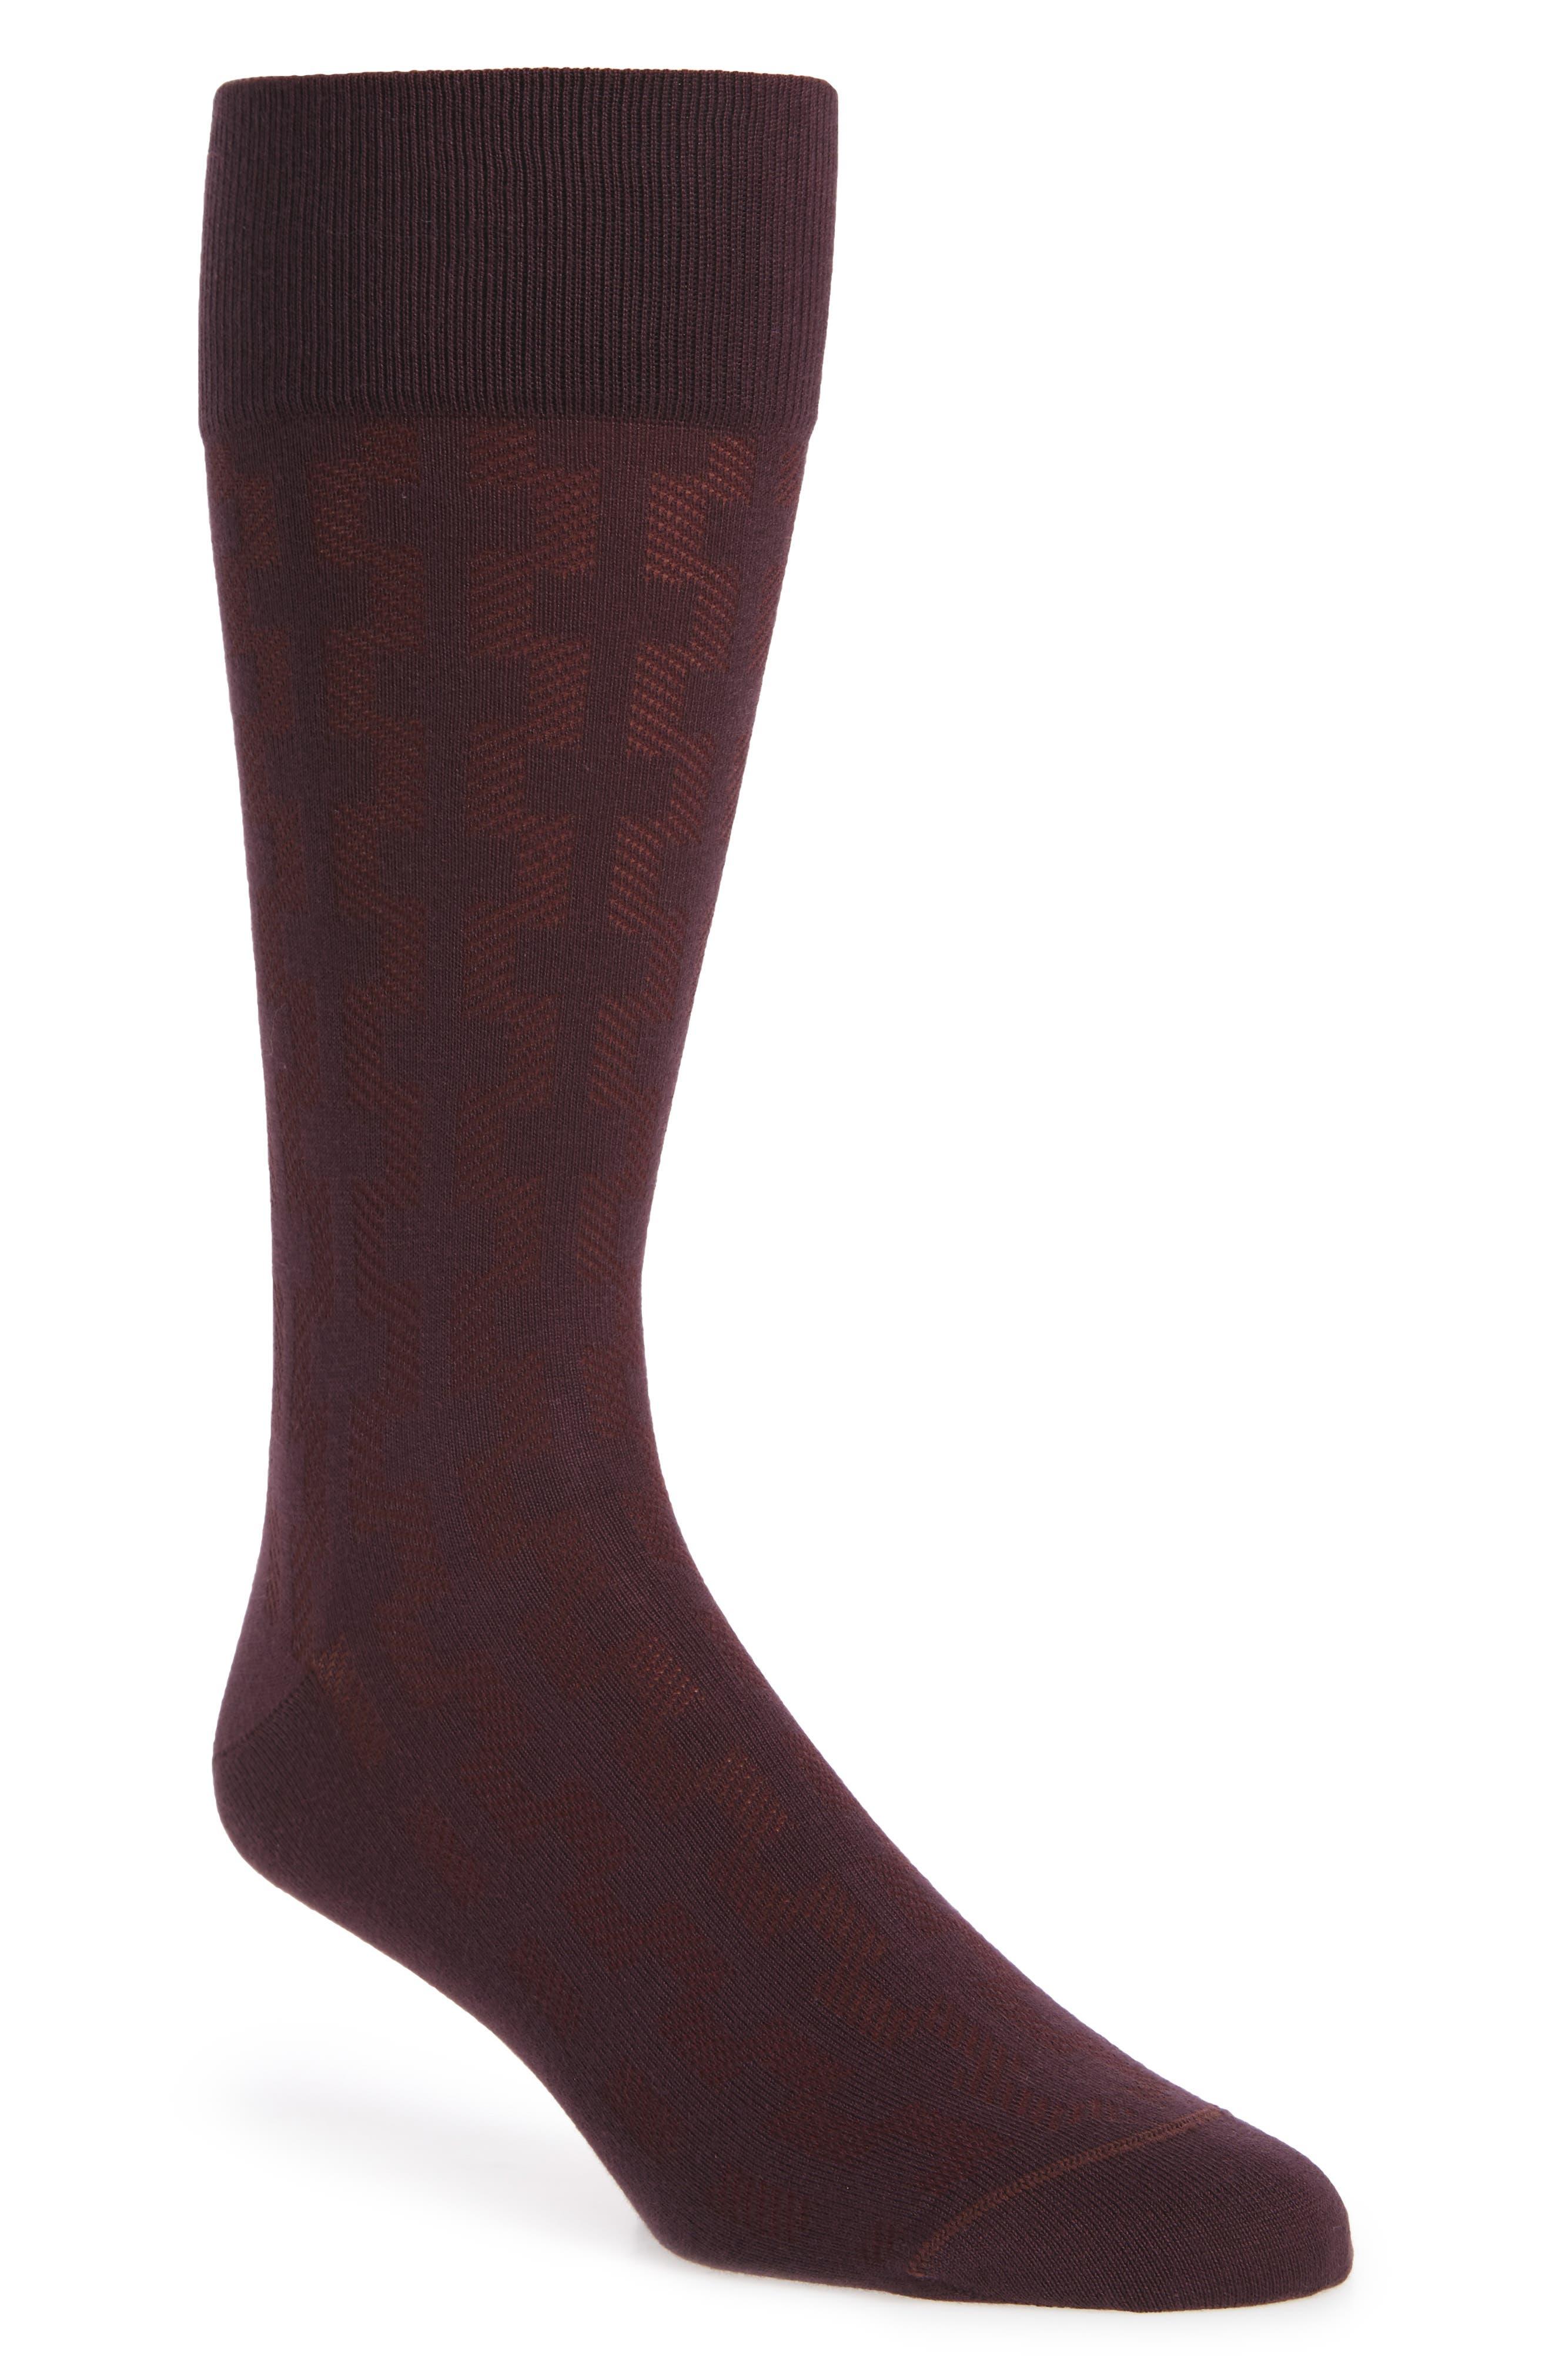 Geometric Socks,                         Main,                         color, Burgundy Fig